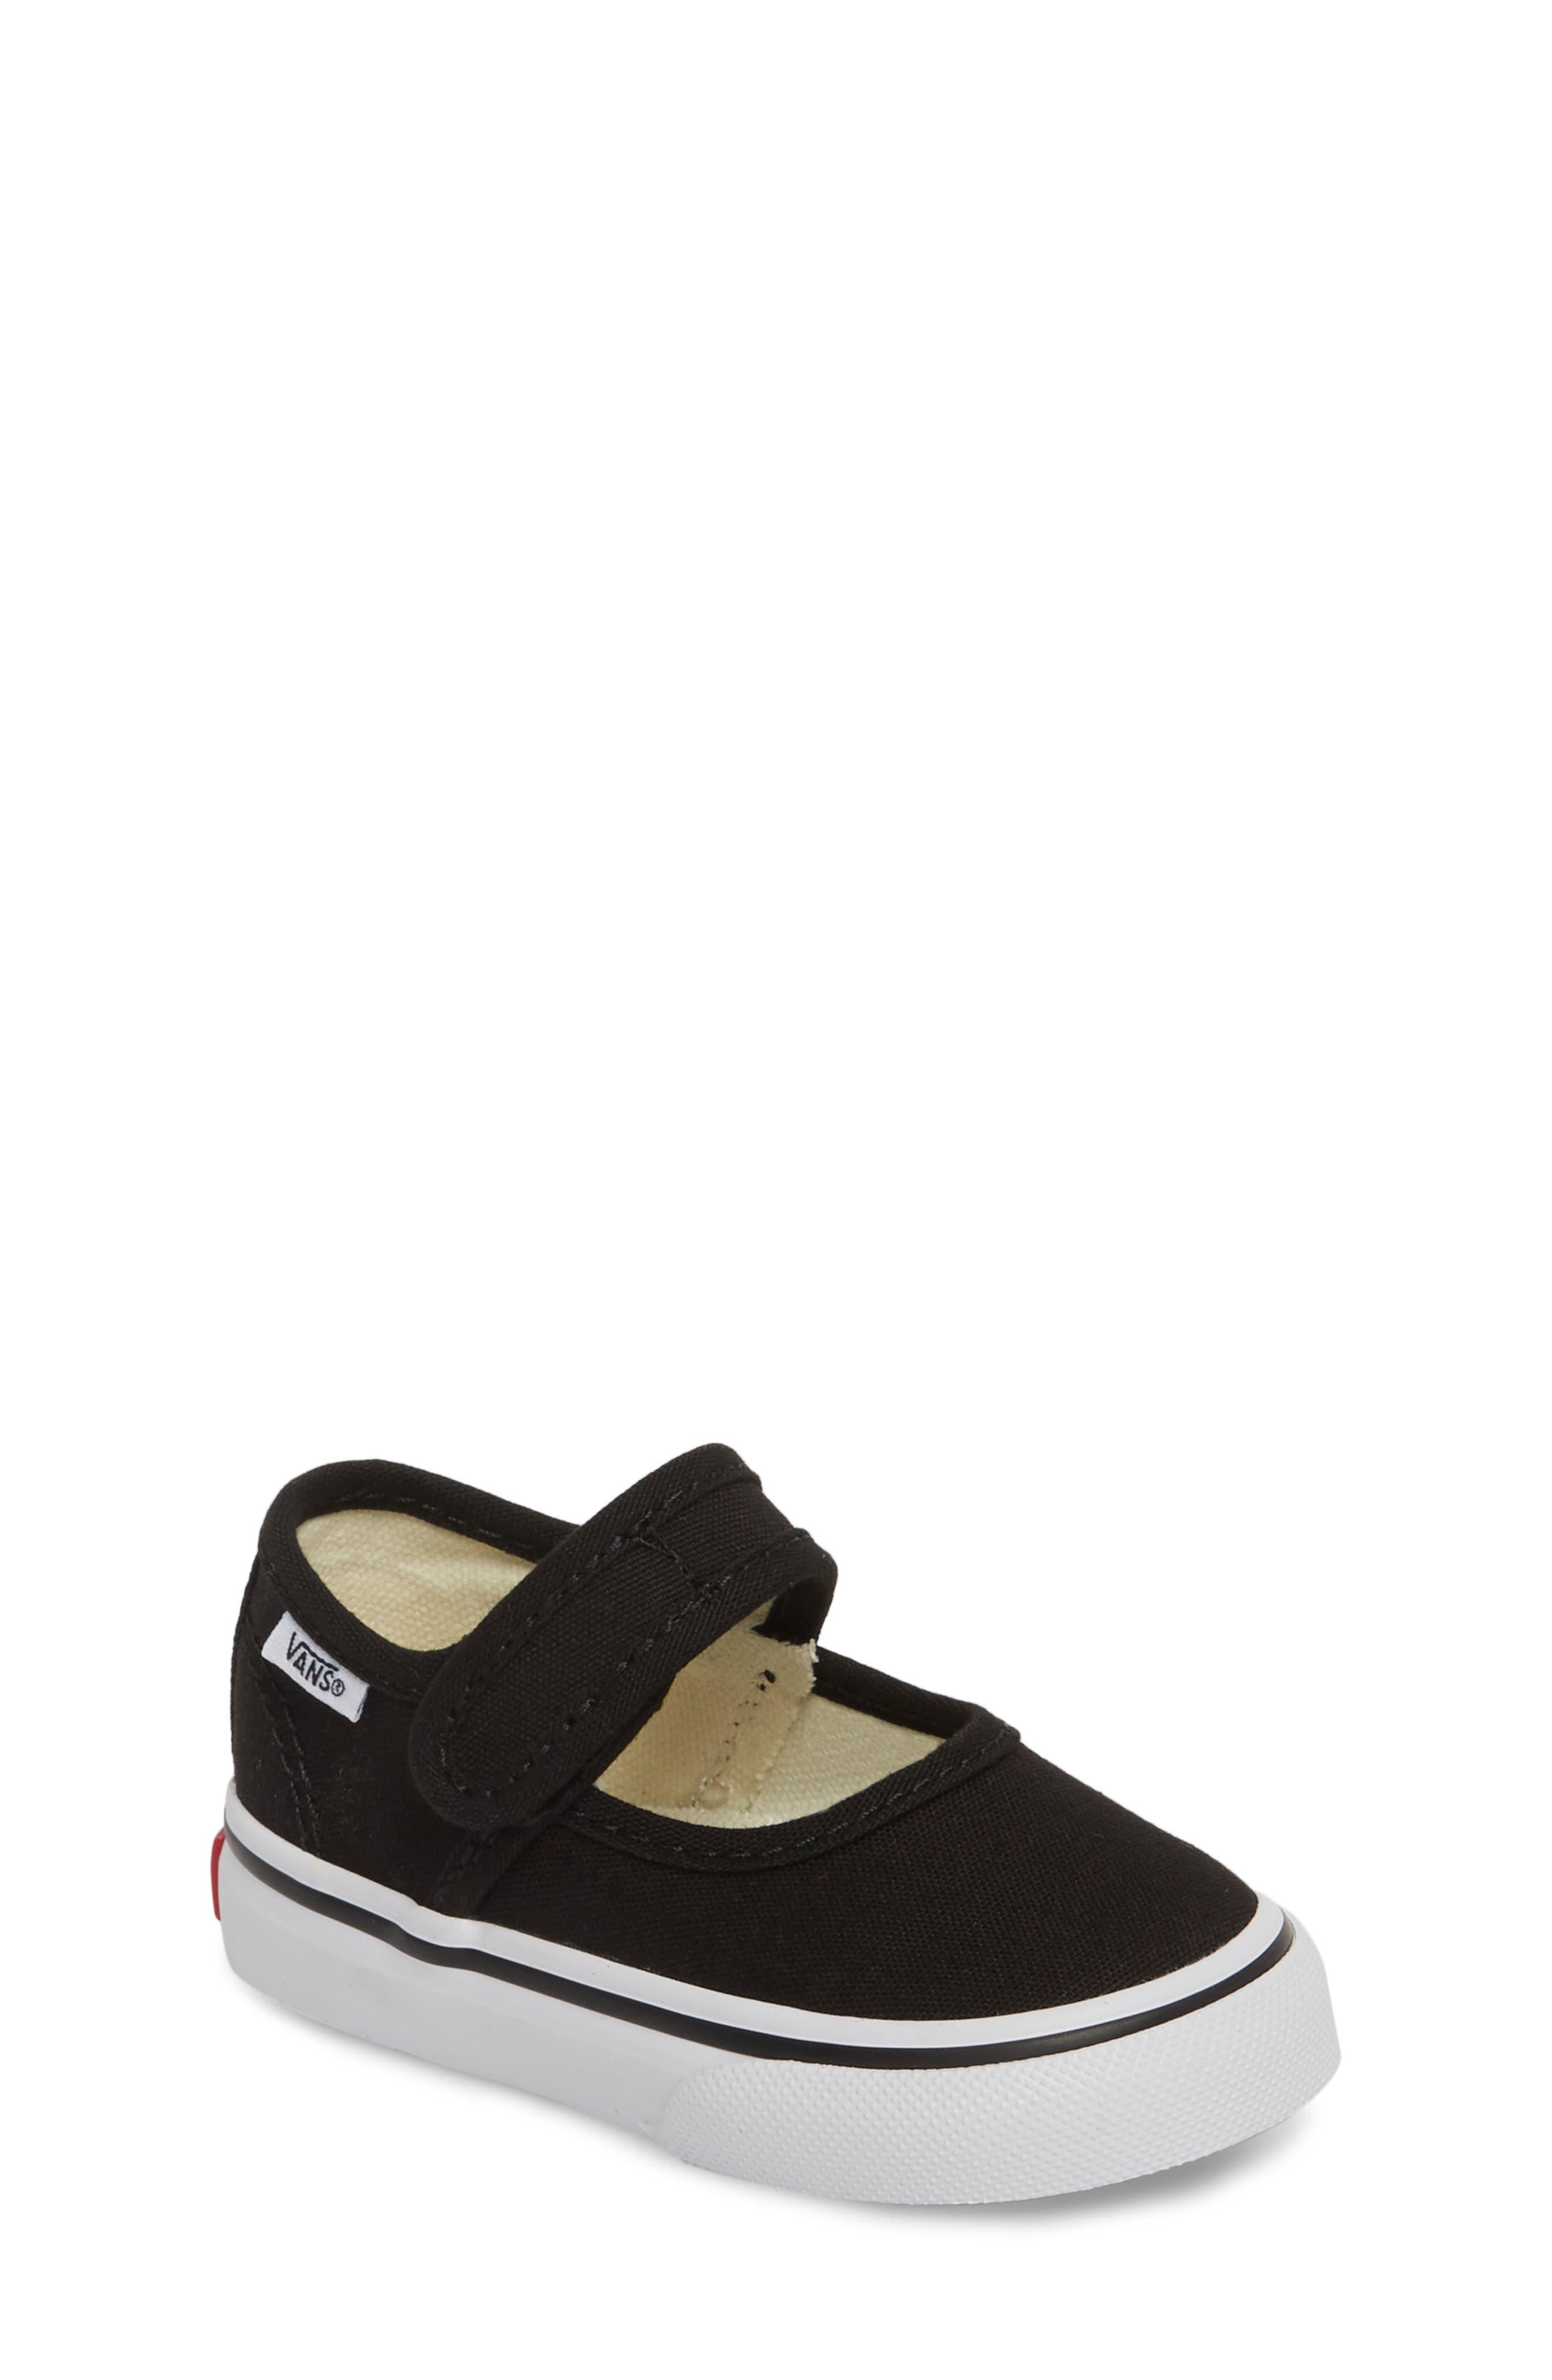 VANS Mary Jane Sneaker, Main, color, 001